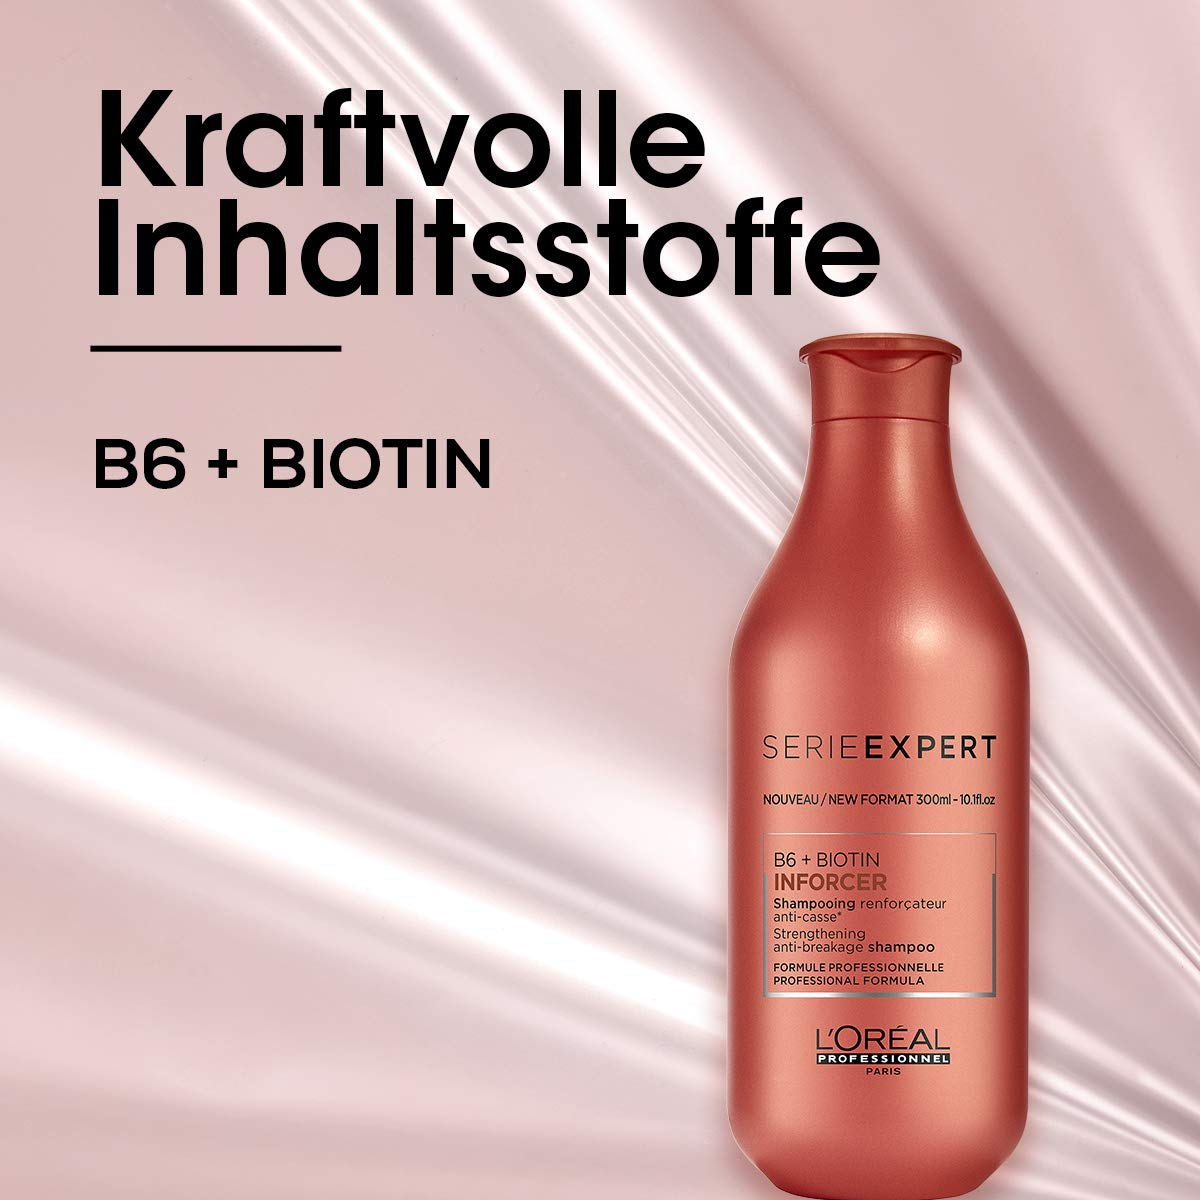 L'Oréal Professionnel Serie Expert Inforcer Shampoo Best biotin shampoo for coloured hair